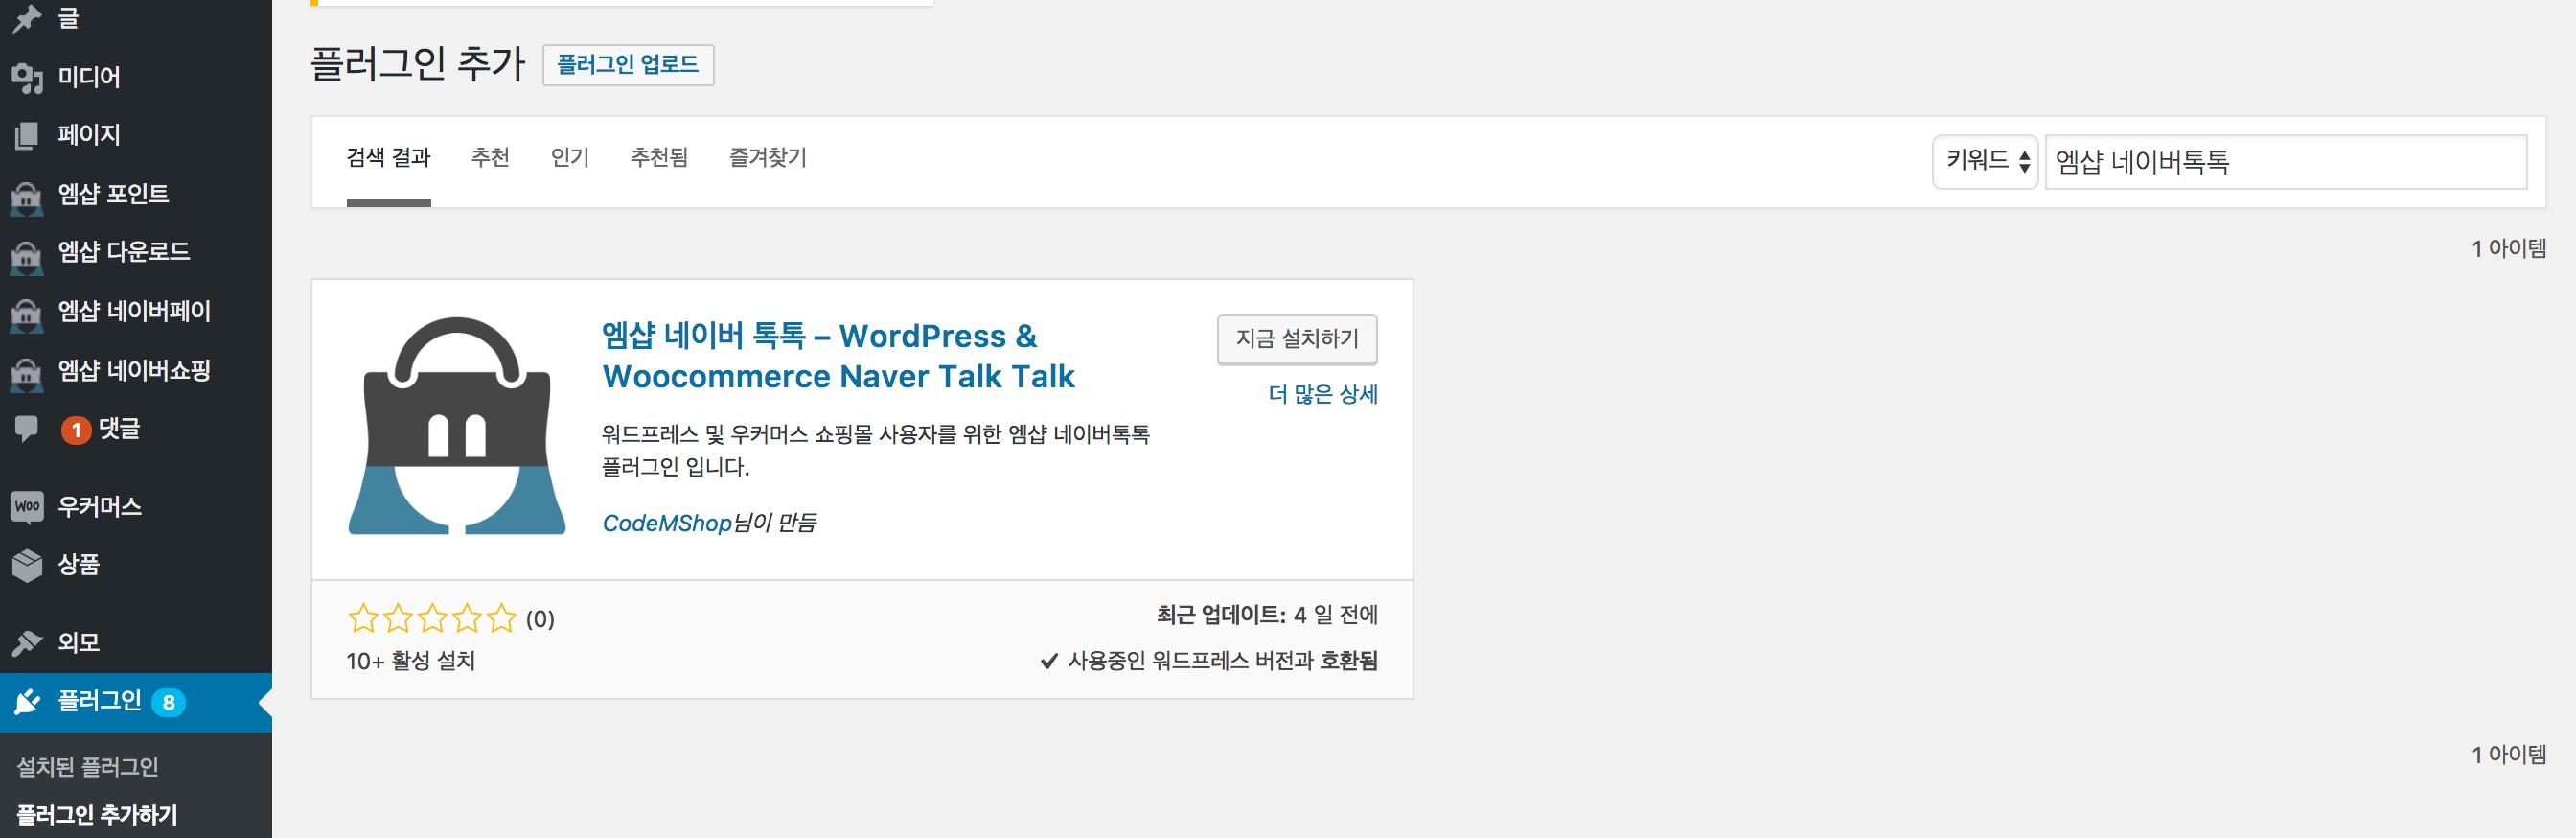 wordpress-live-chat-naver-talktalk-codemshop-6